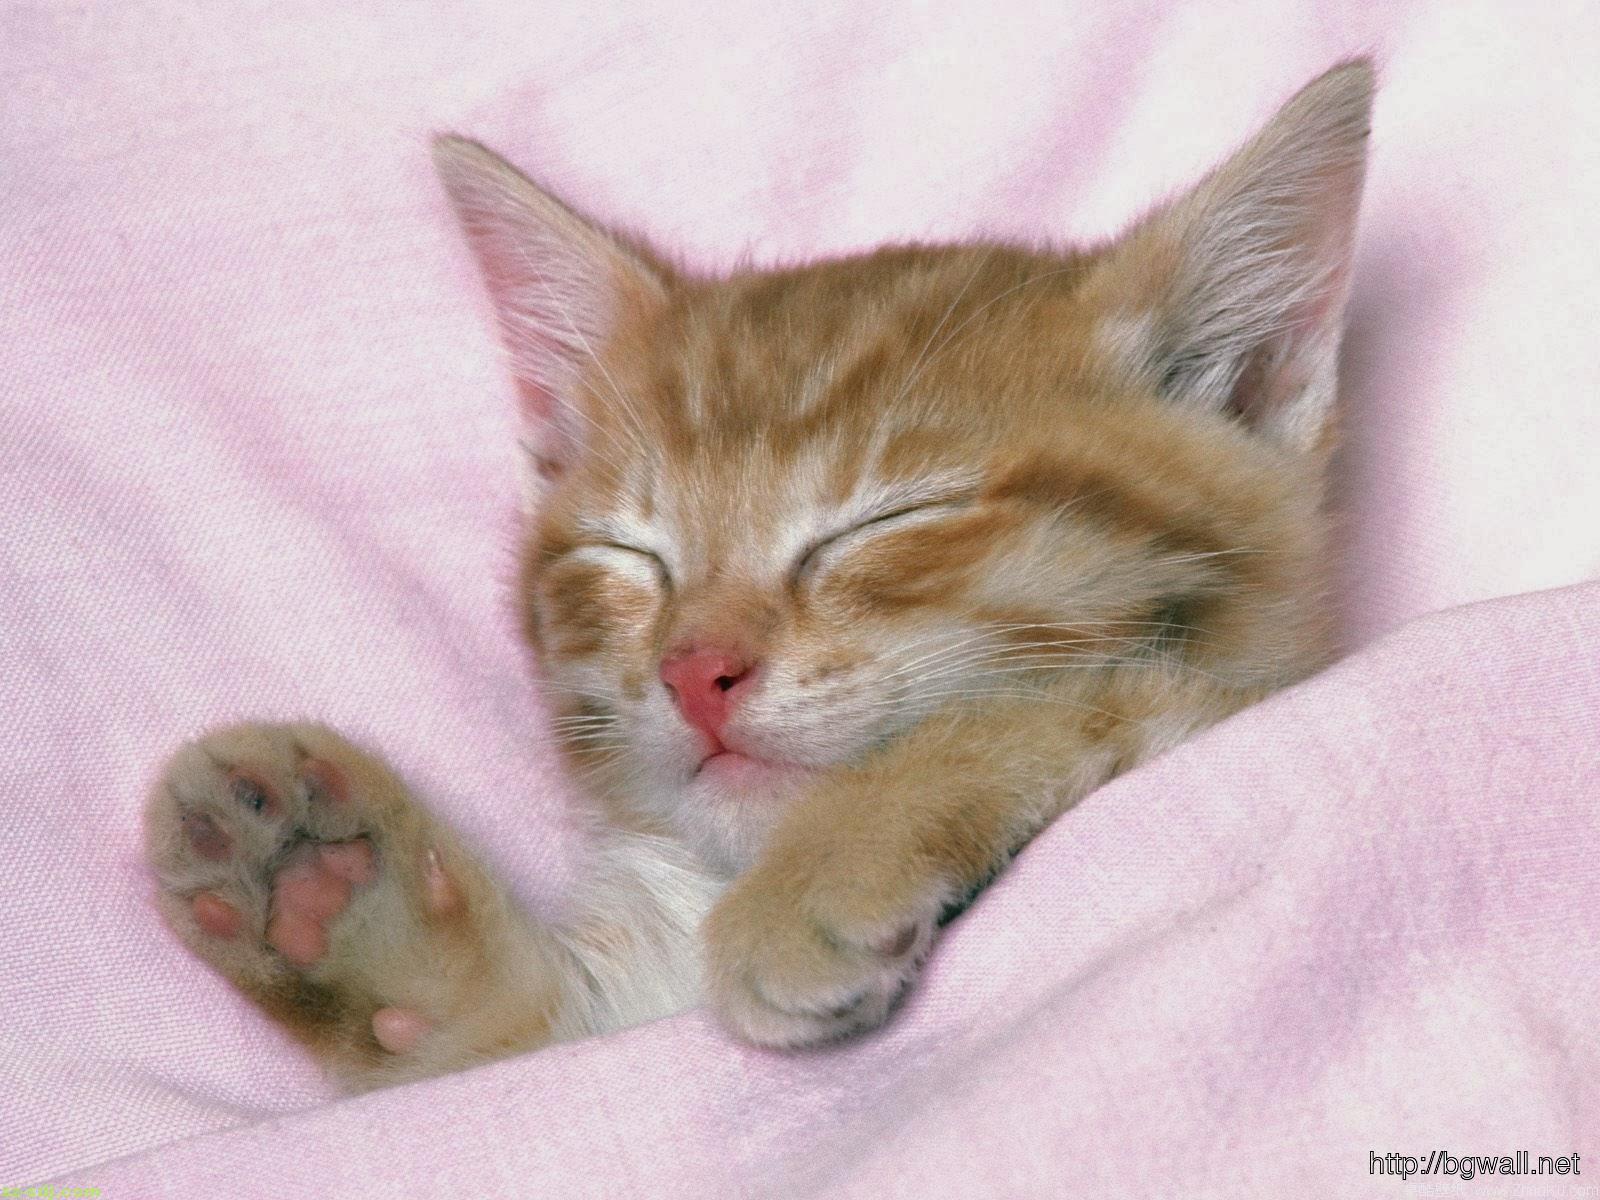 cute-kitten-sleep-on-pink-bed-wallpaper-pc-high-definition